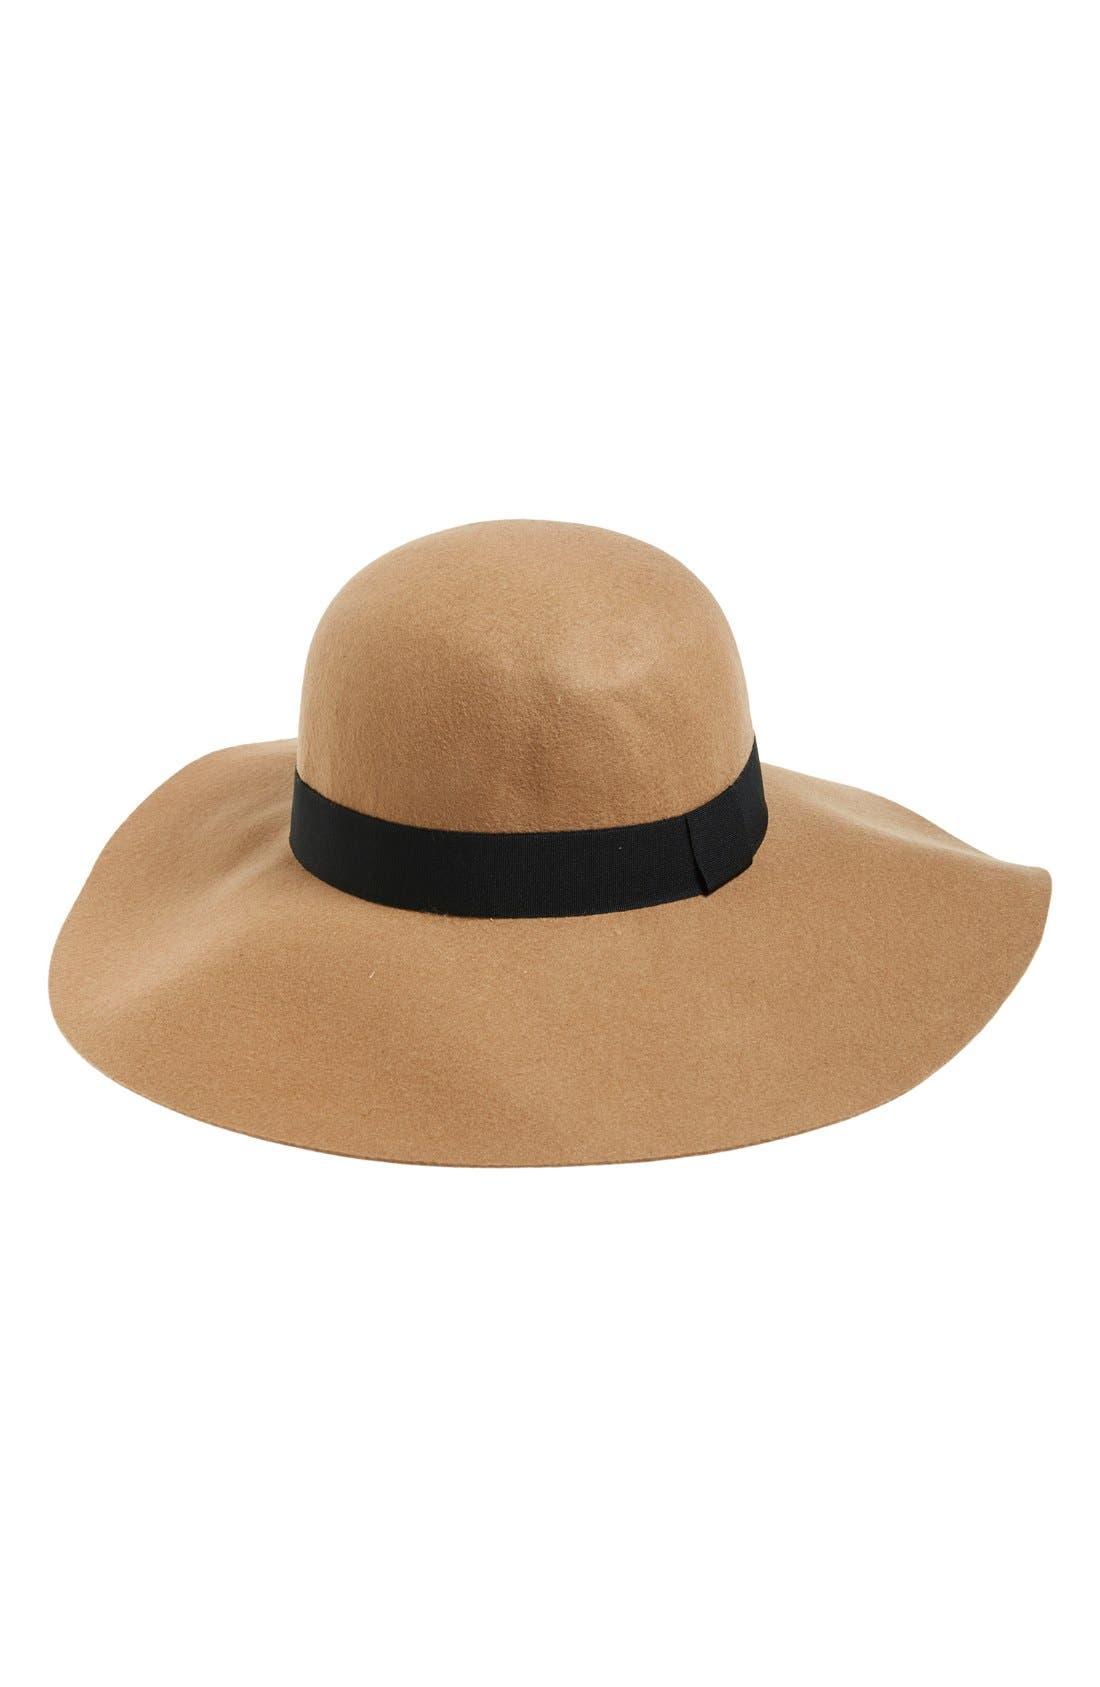 Alternate Image 1 Selected - David & Young Floppy Felt Hat